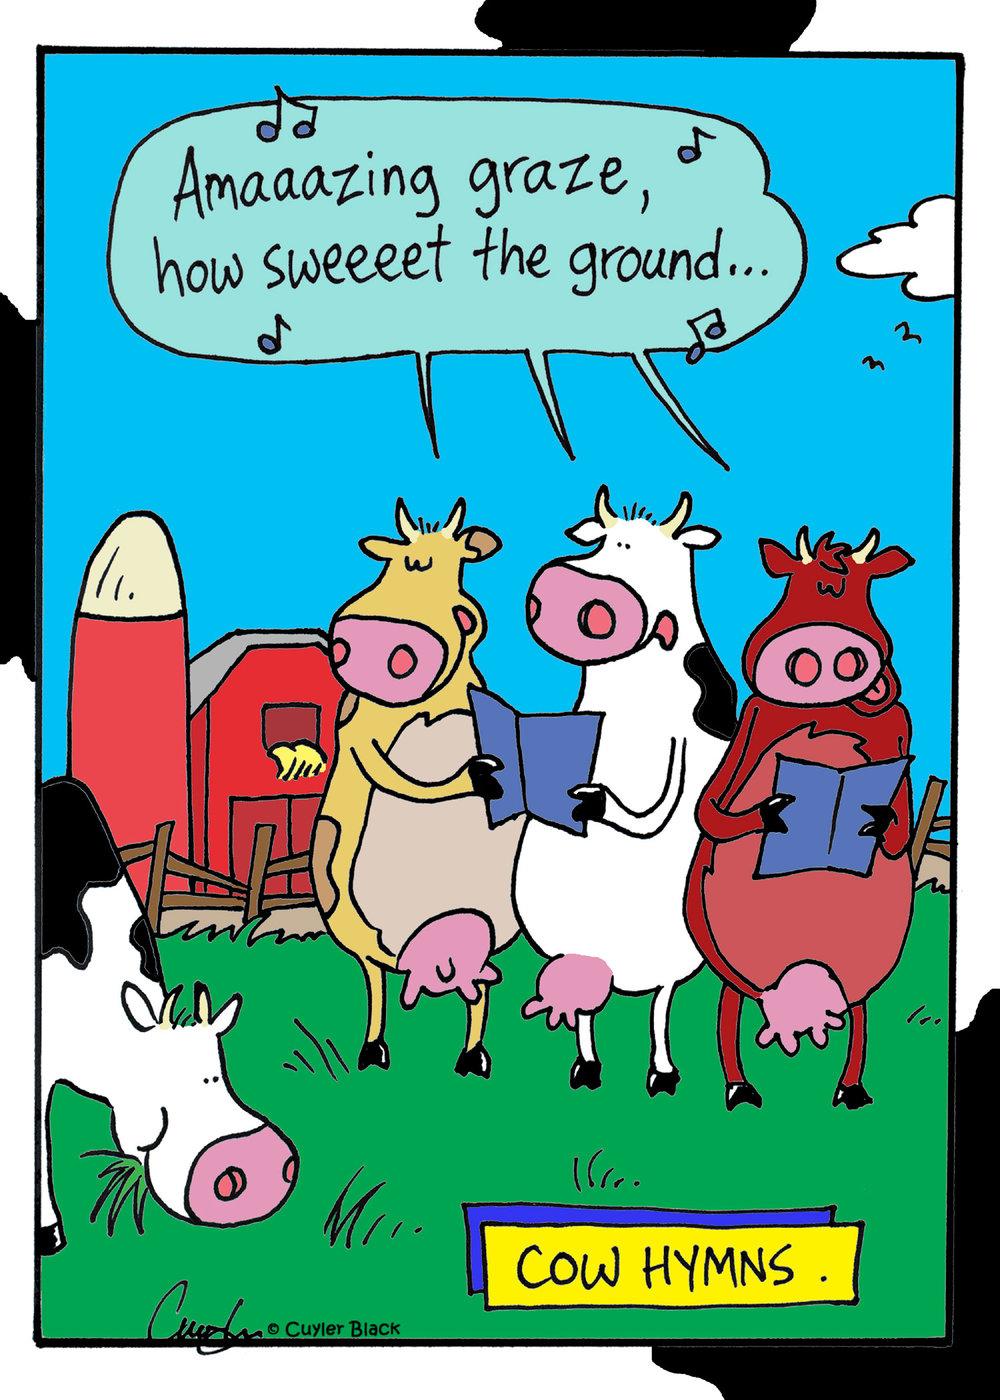 cow hymns.jpg